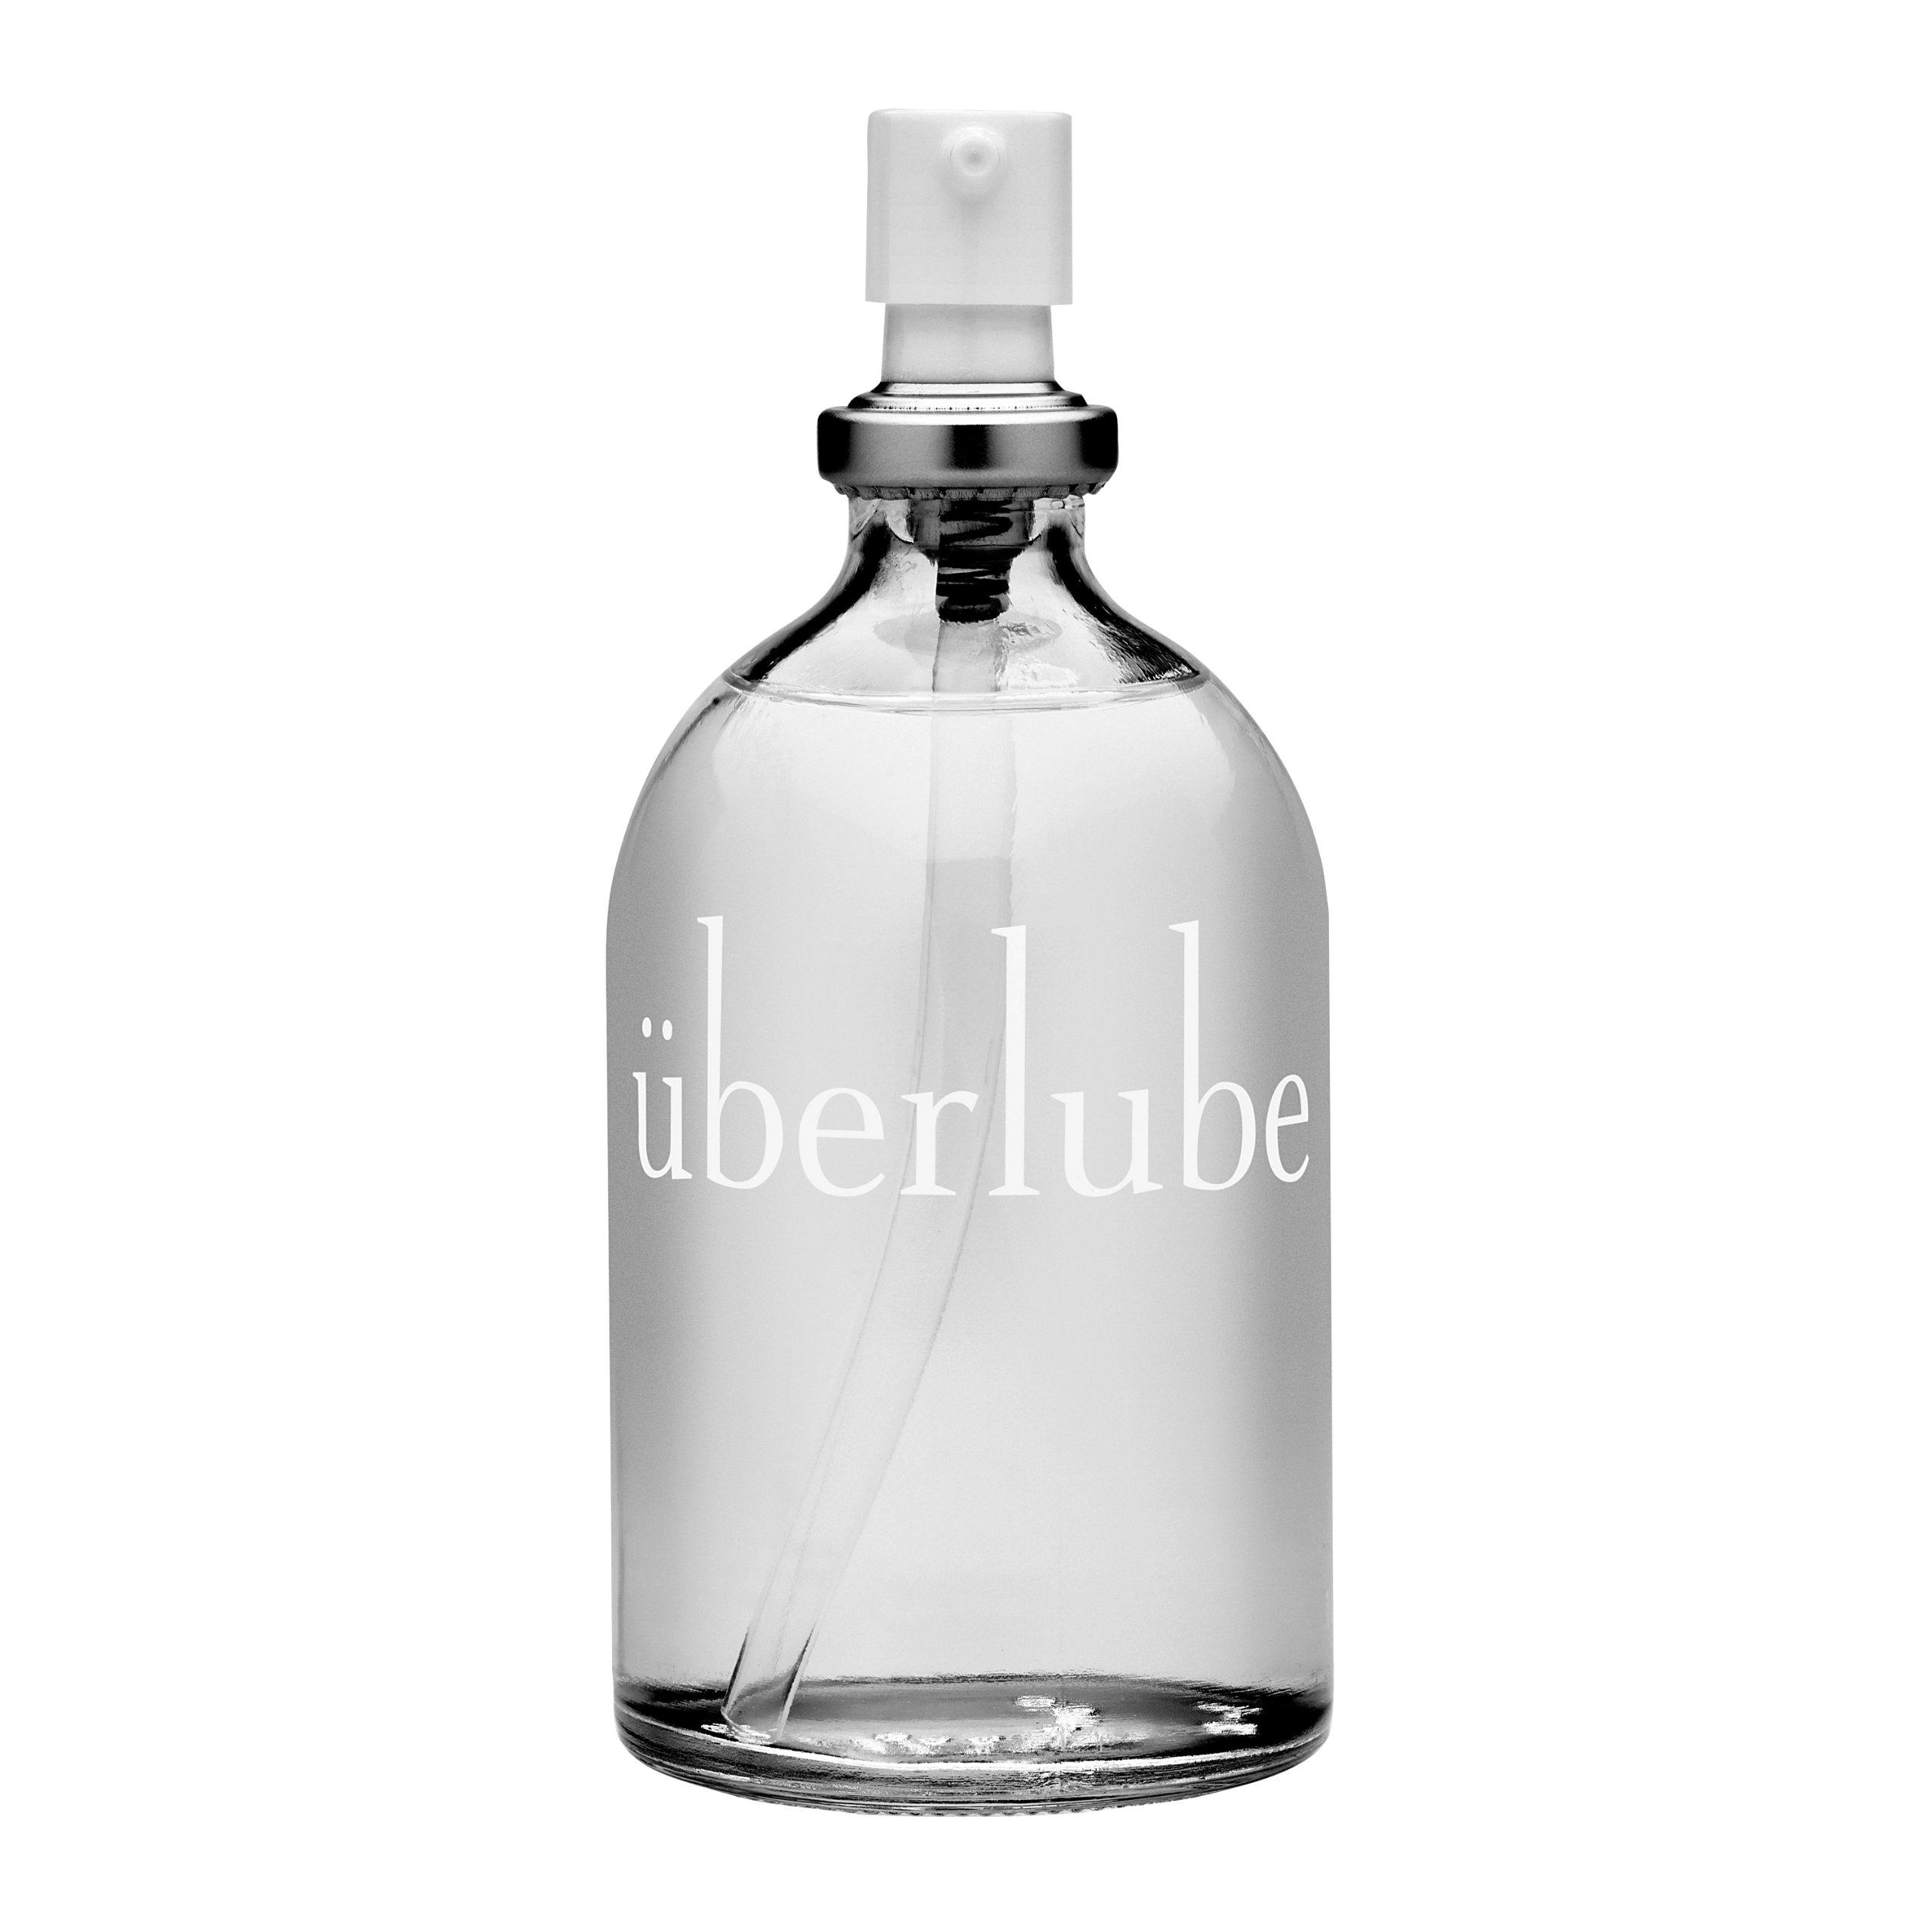 Überlube Luxury Lubricant 100ml by Überlube